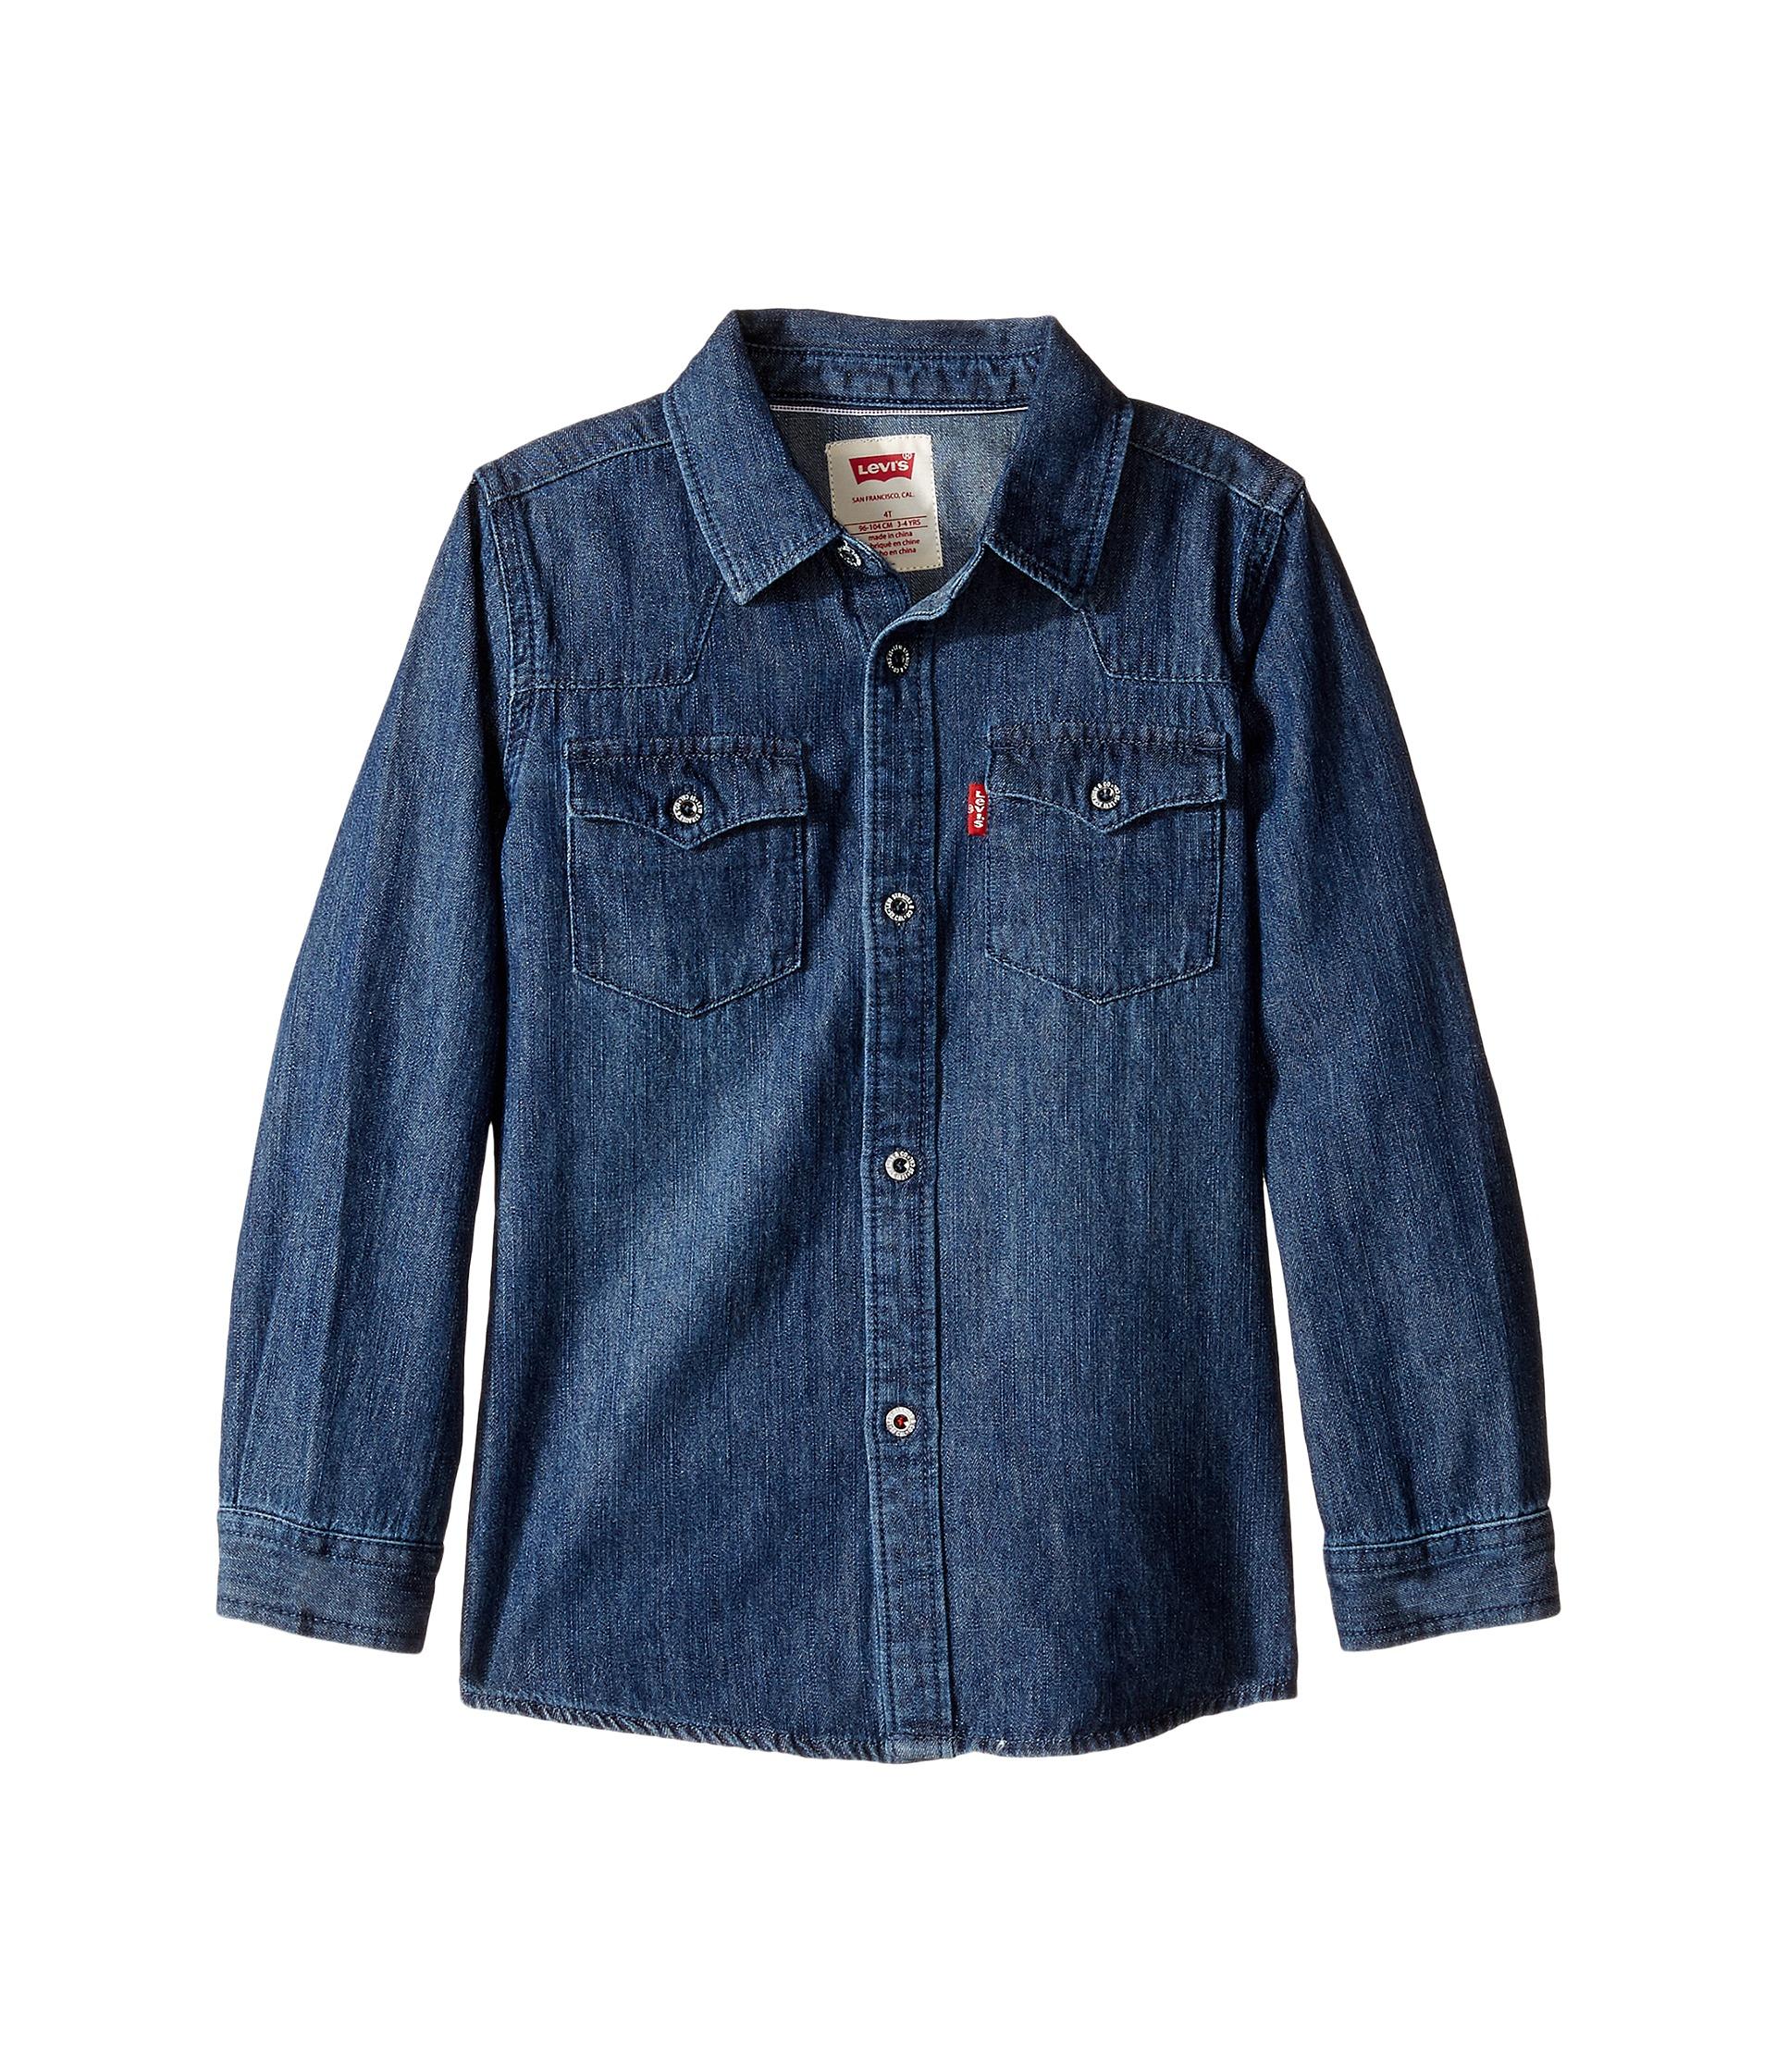 Levi's Boys Denim Pocket Shirt - Blue 3T